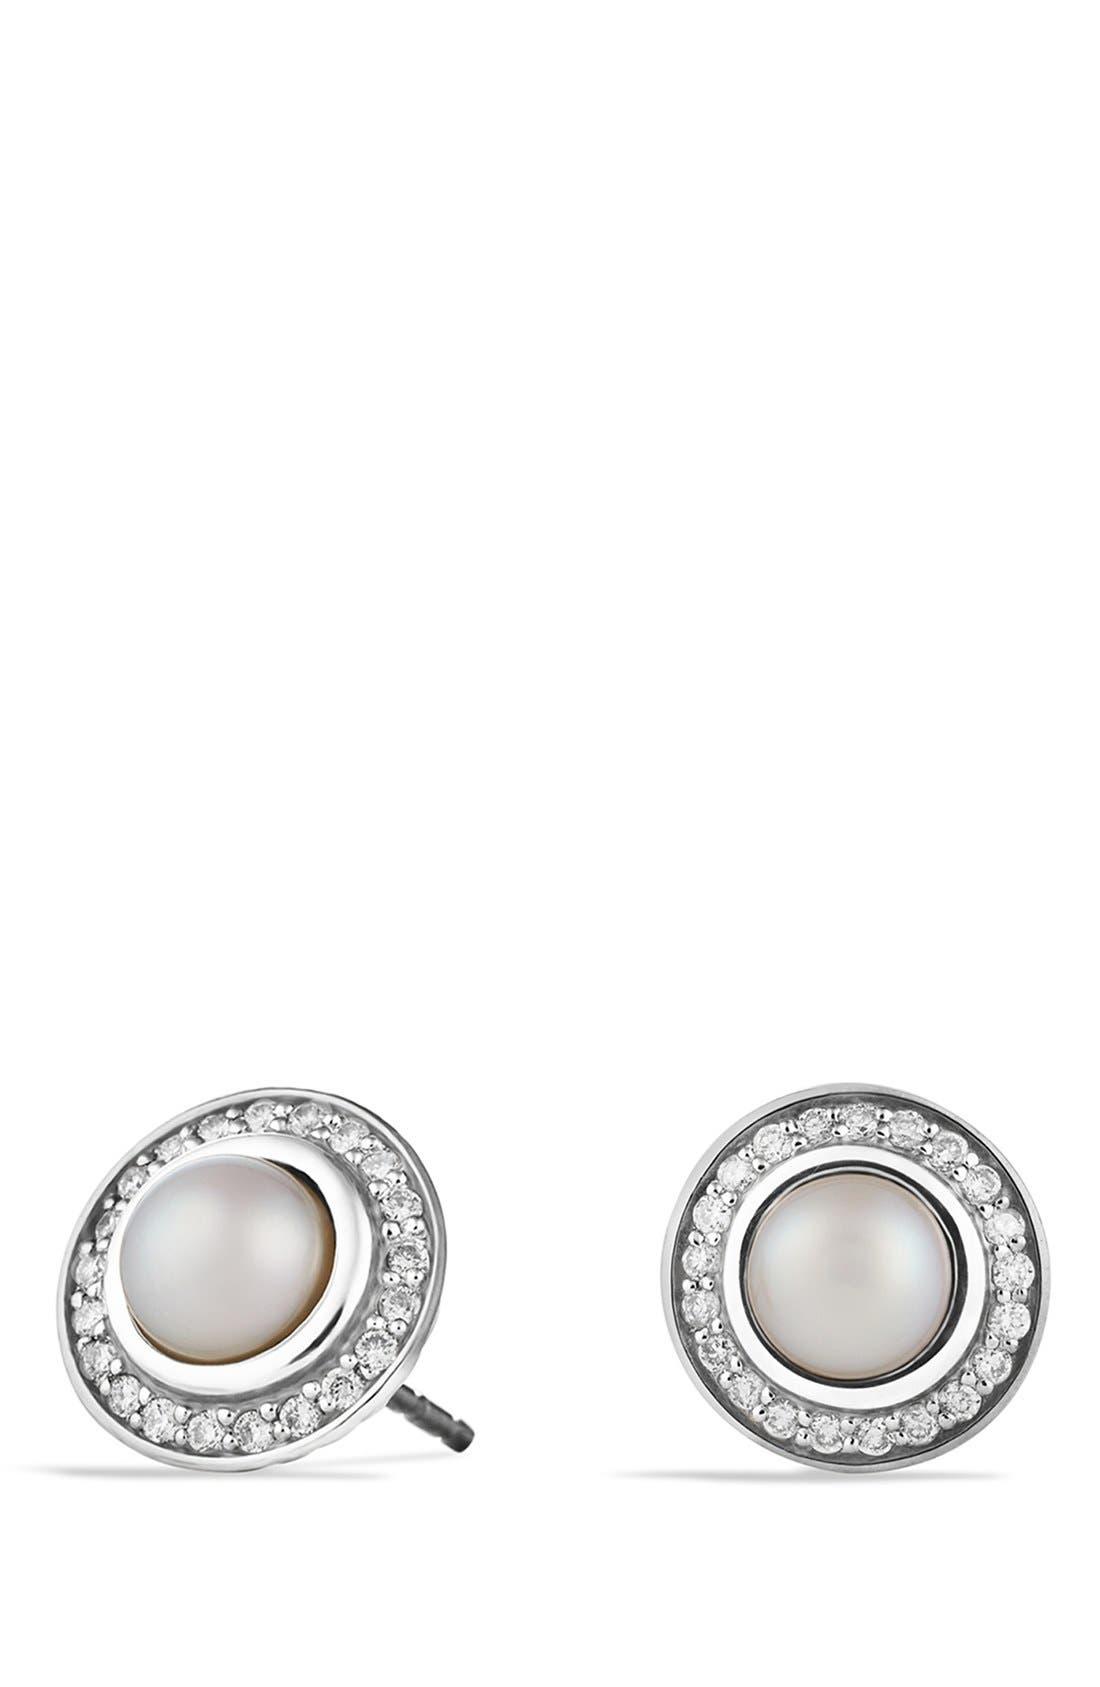 Main Image - David Yurman 'Cerise' Mini Earrings with Semiprecious Stone & Diamonds